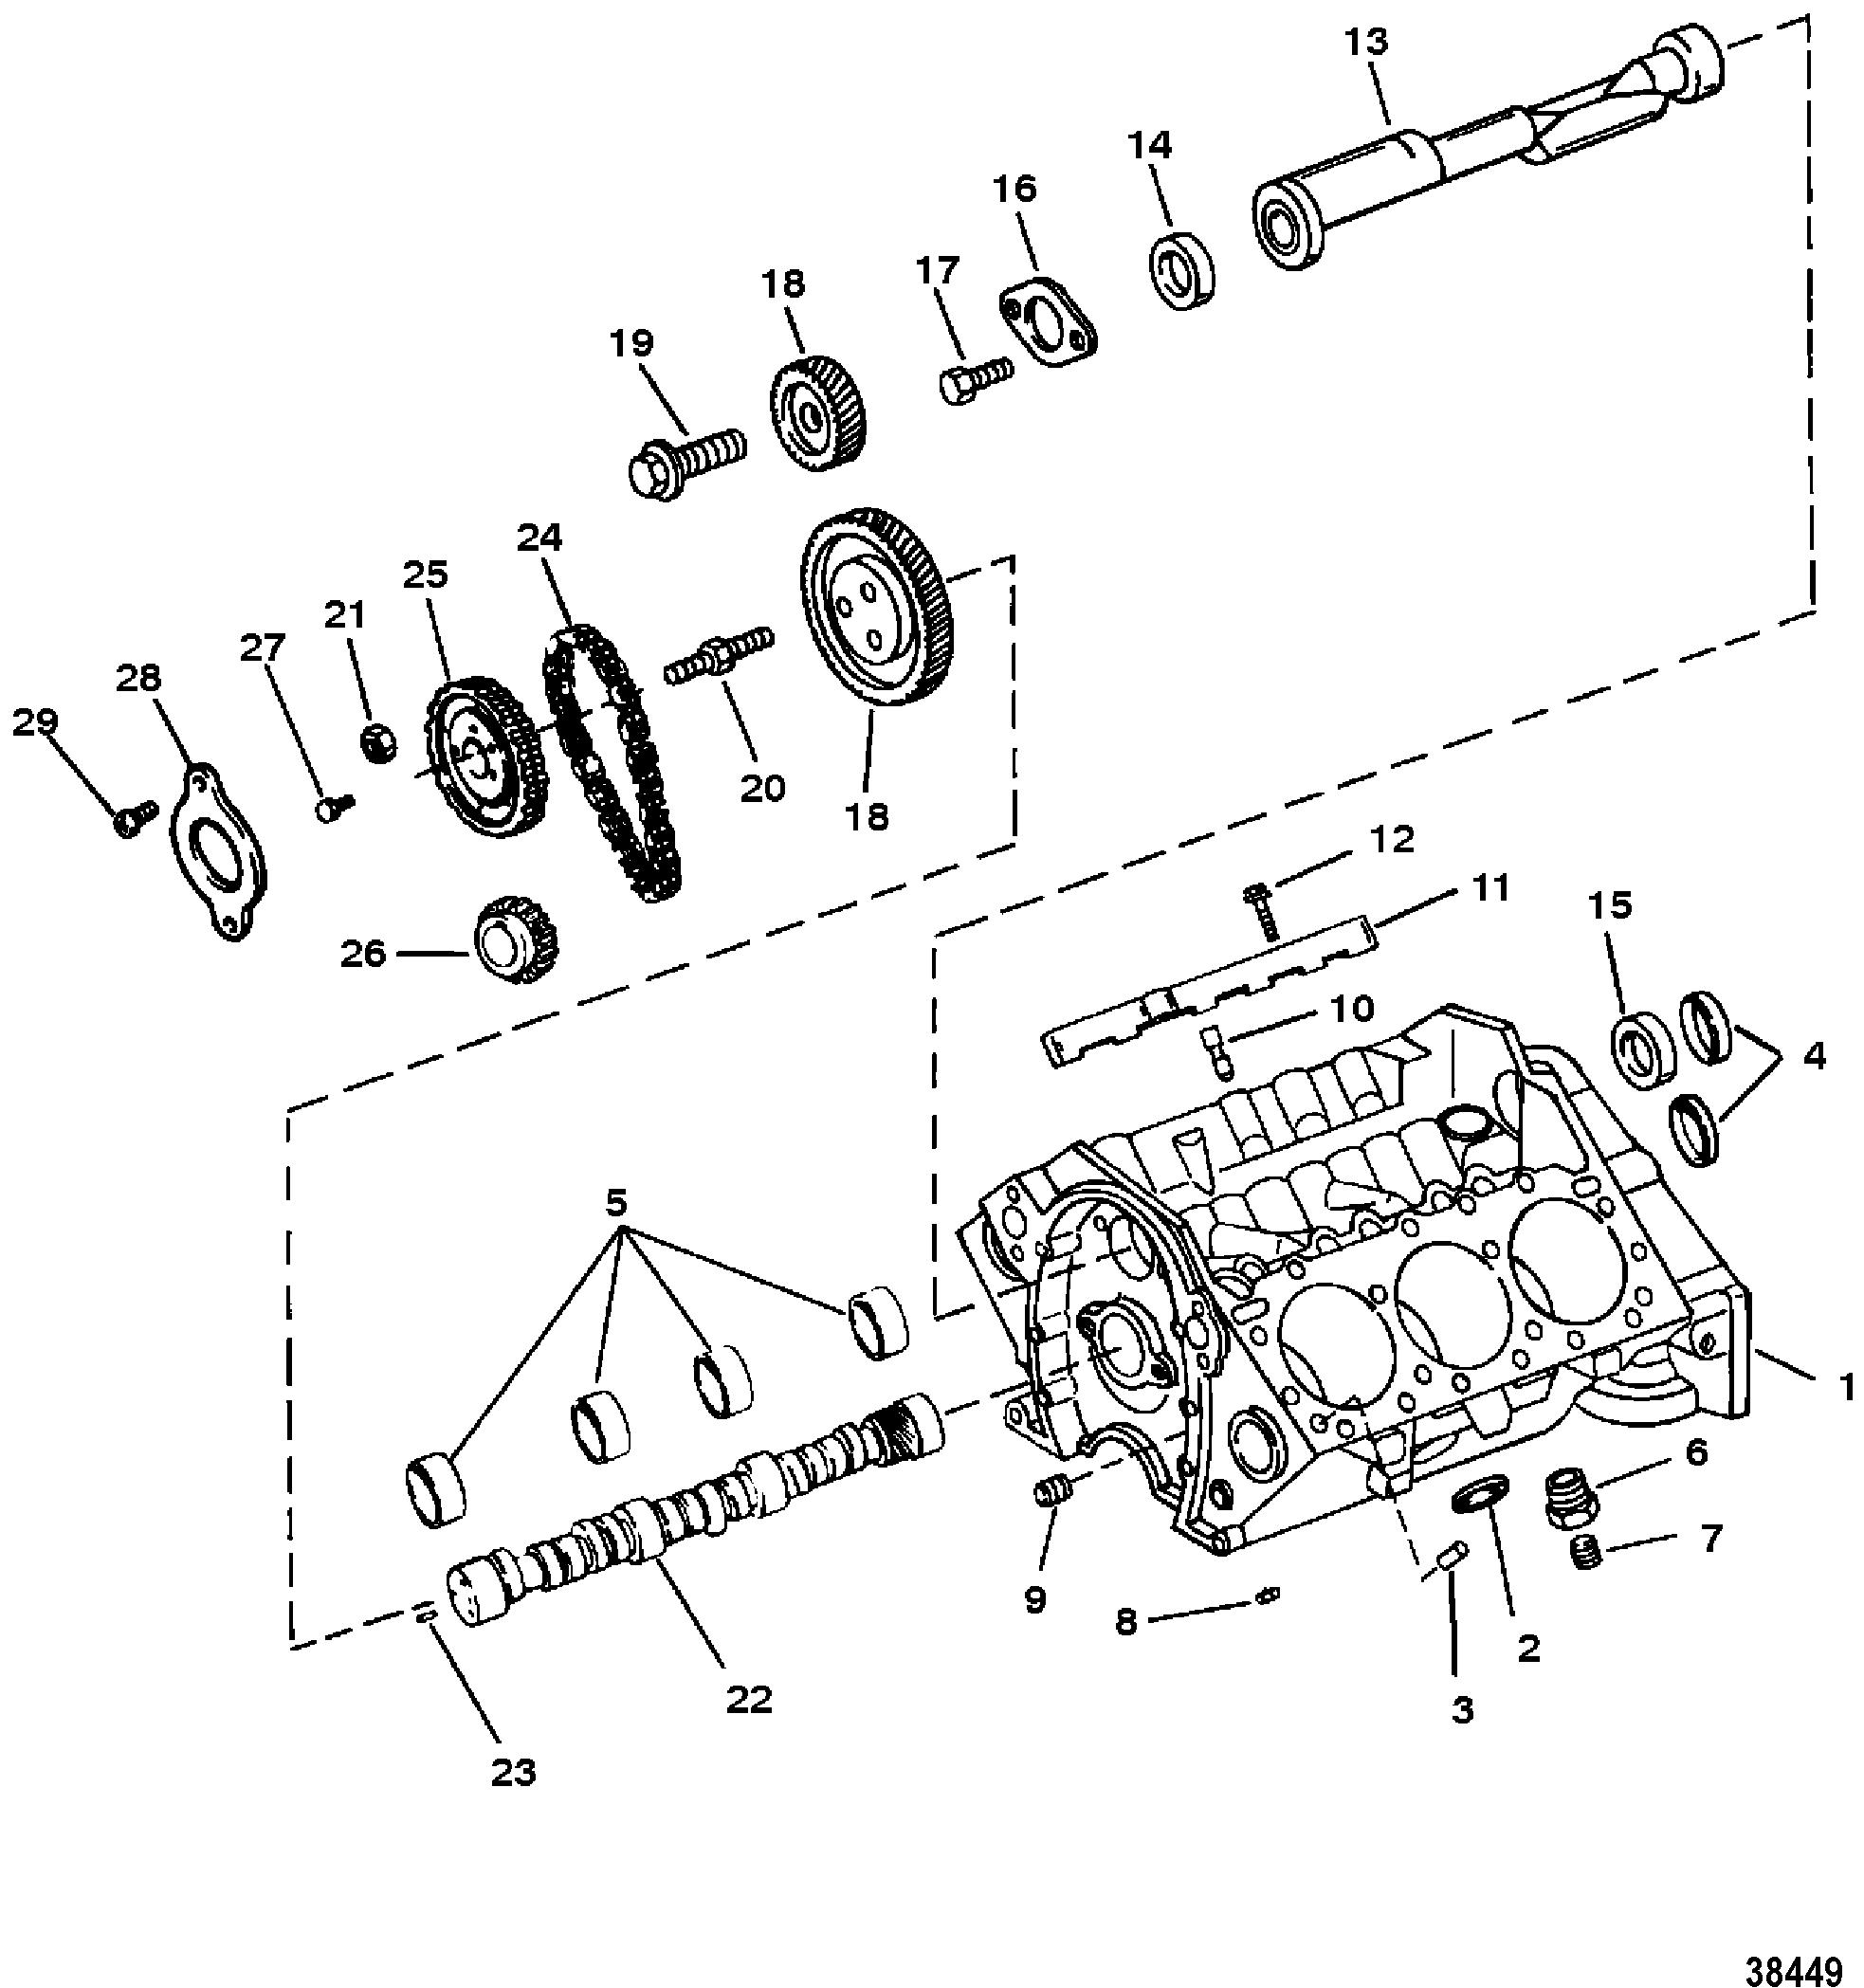 cylinder block and camshaft for mercruiser 4 3l 4 3lx alpha one engine 262 cid ii